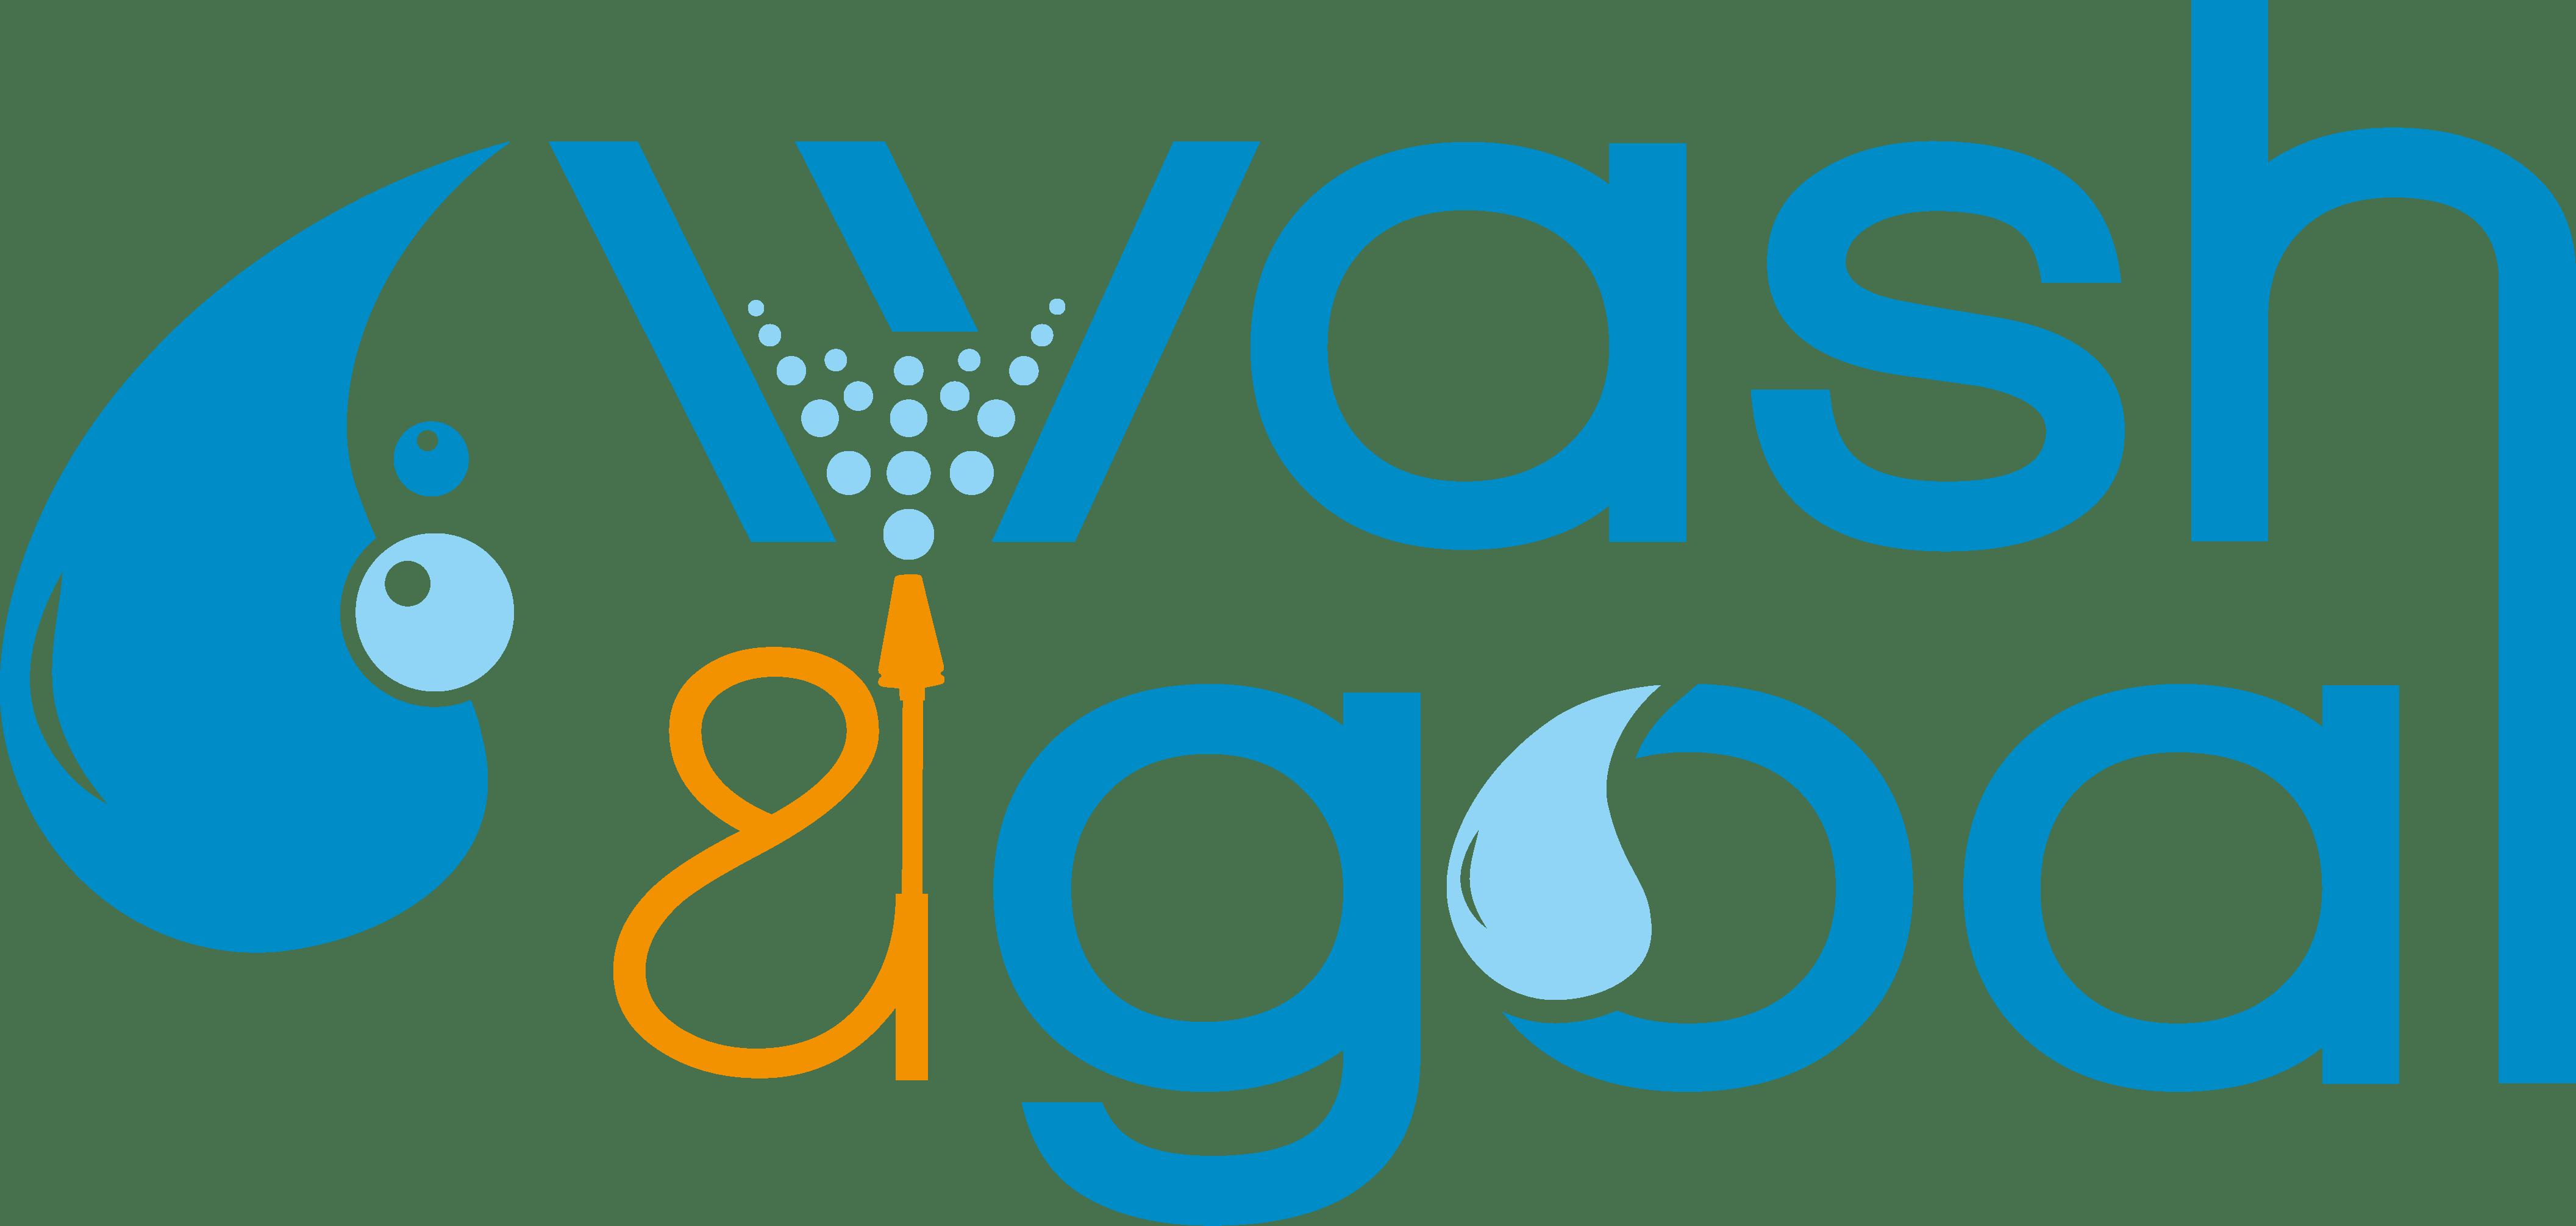 Wash & Goal